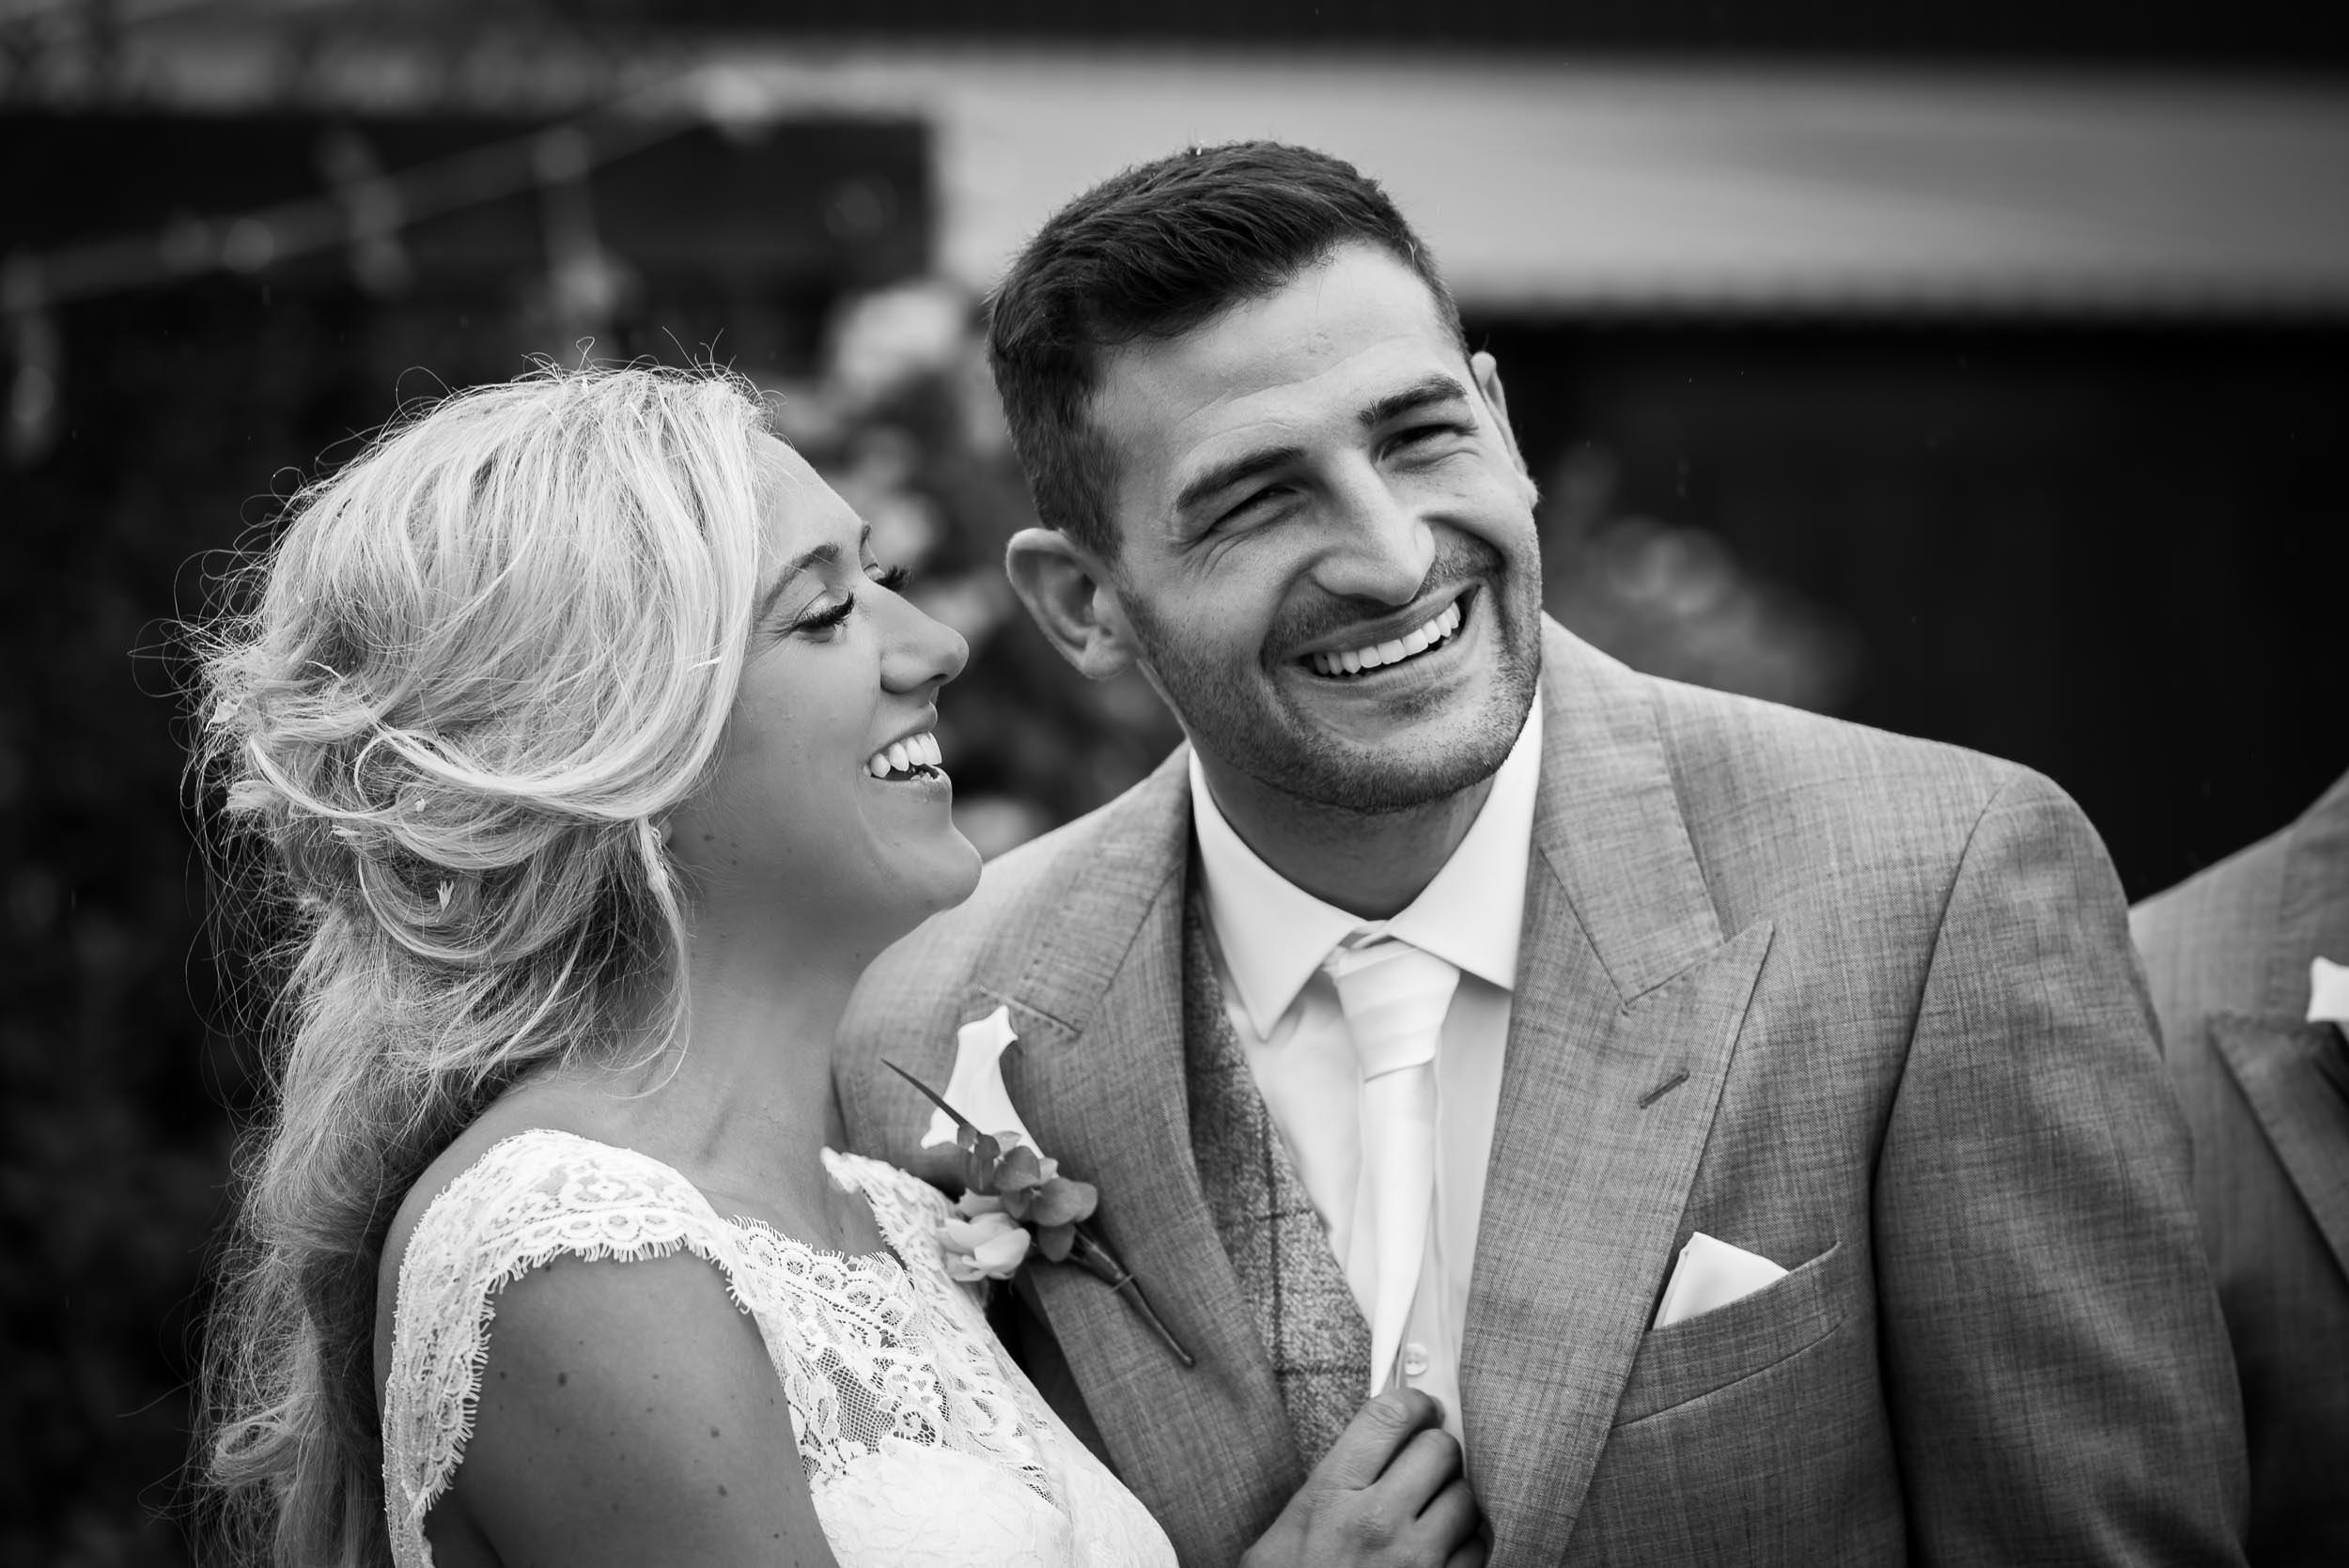 NC-20170722-sophie-and-jonny-wedding-0372.jpg